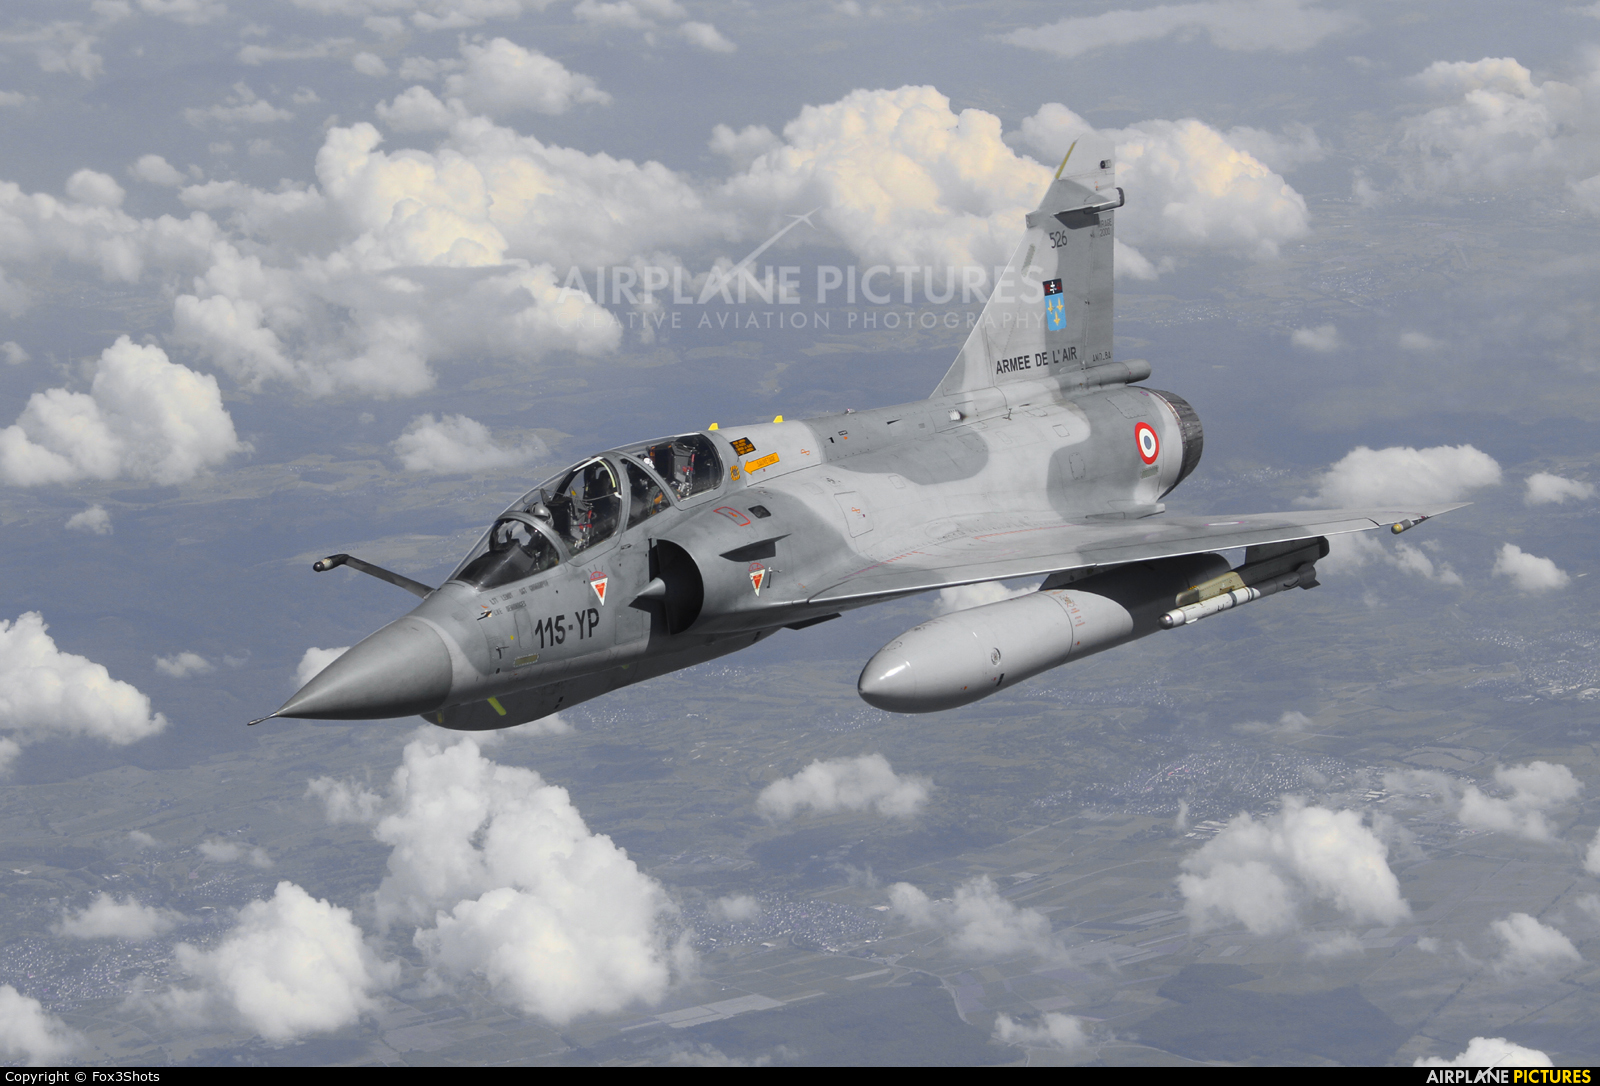 France - Air Force 115-YP aircraft at In Flight - France